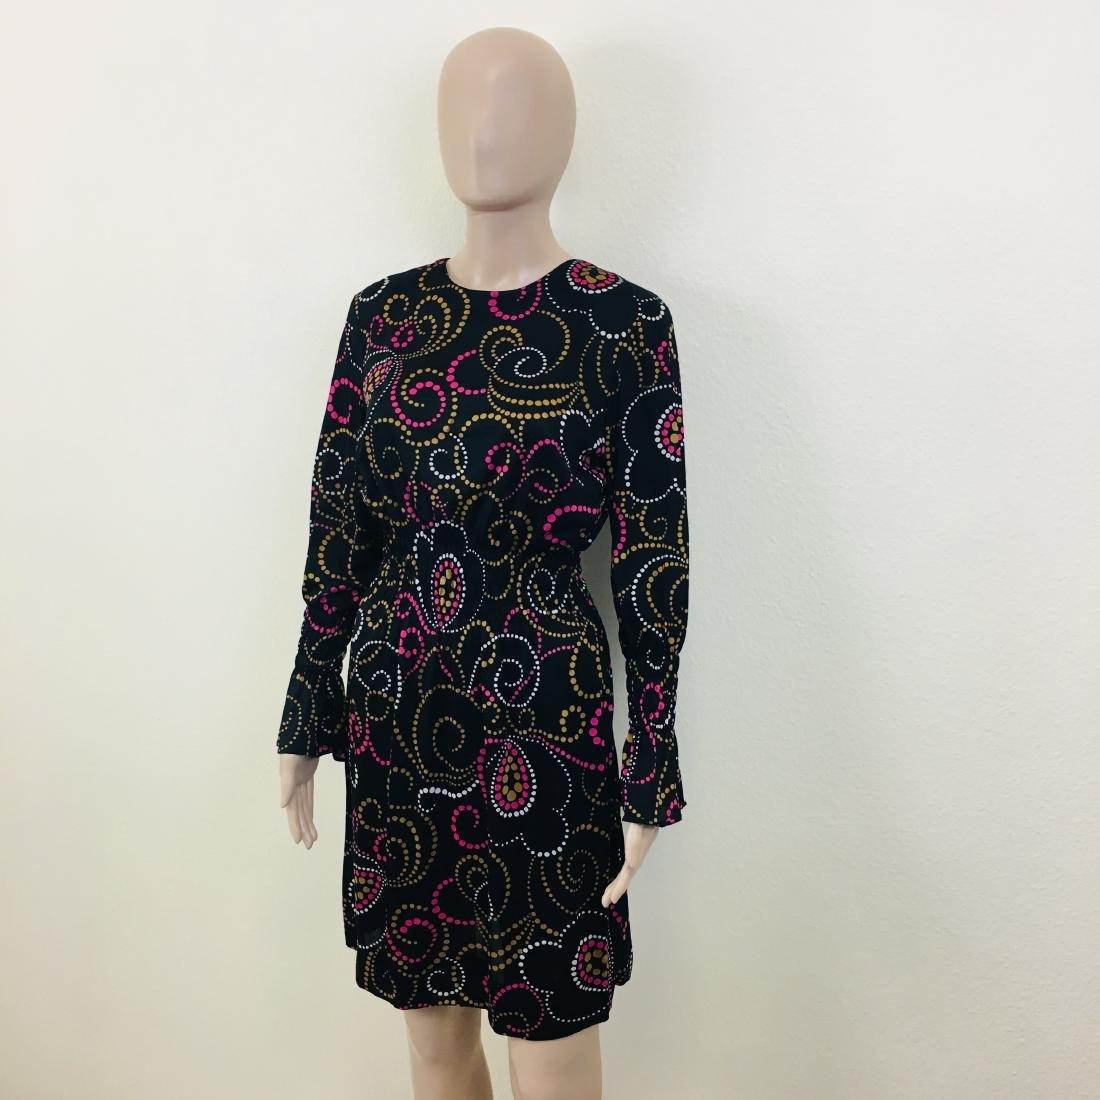 Vintage Women's Black Dress - 3